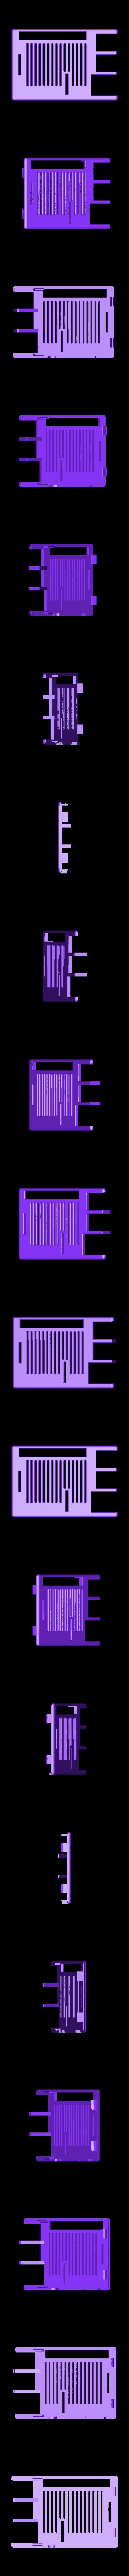 Pi_Snug_Case_Top_Slots.stl Download free STL file Raspberry Pi Snug Case • 3D printable design, Aralala